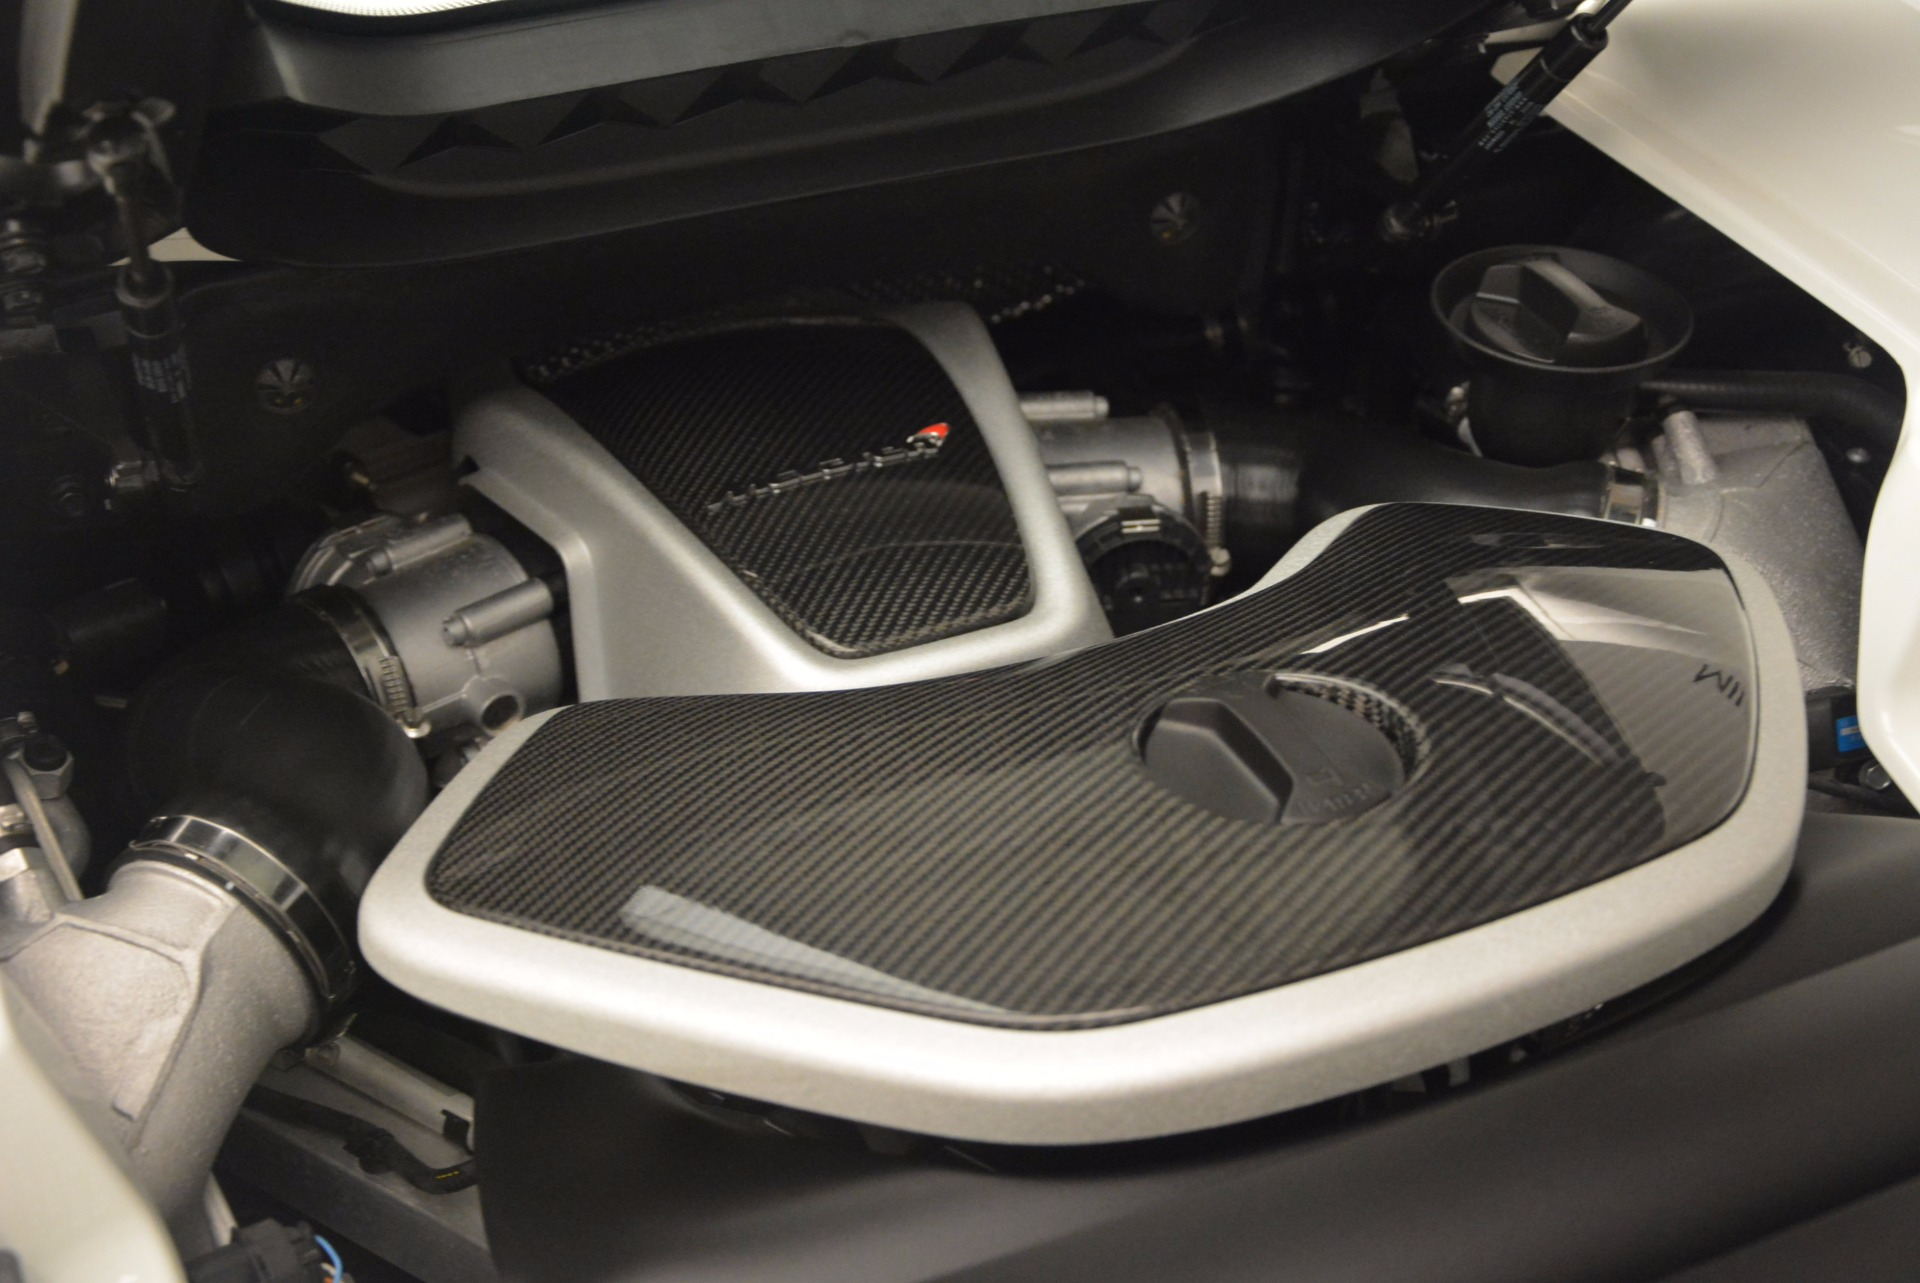 Used 2014 McLaren MP4-12C Spider For Sale In Greenwich, CT. Alfa Romeo of Greenwich, 3136 908_p23